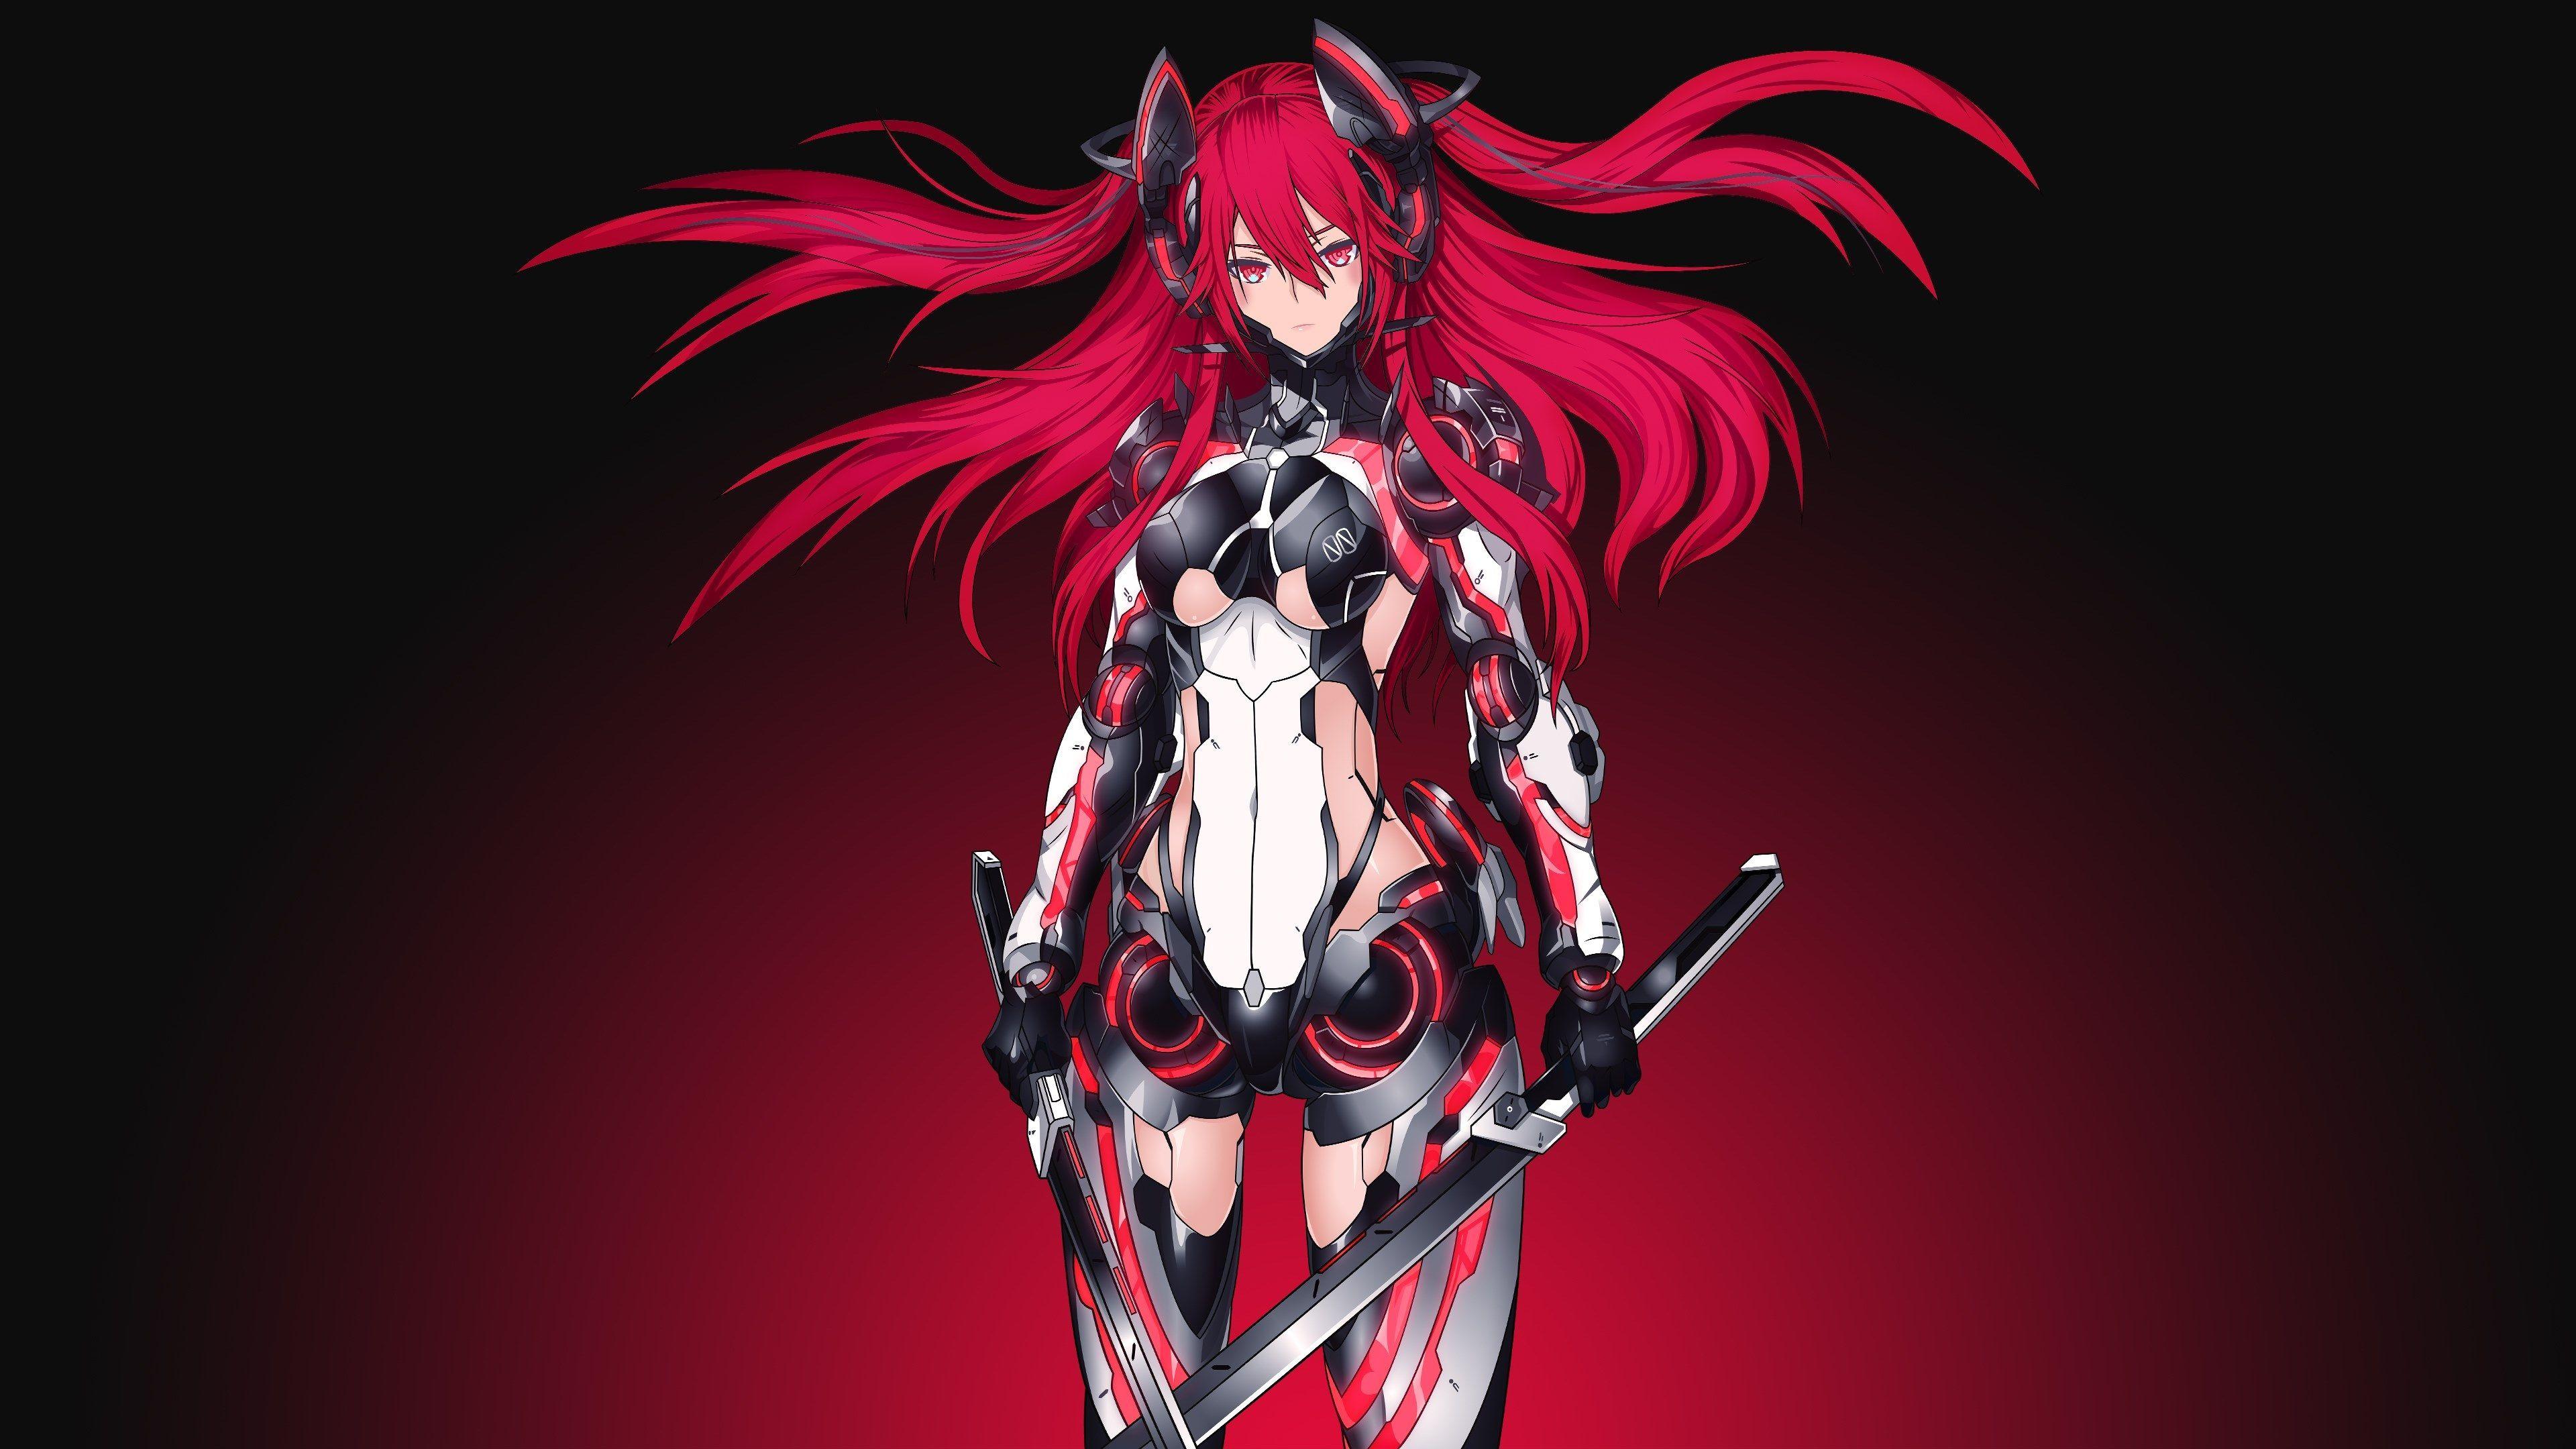 3840x2160 Mecha Girl 4k Pc Wallpaper Download Anime Wallpaper Cool Anime Wallpapers Hd Anime Wallpapers